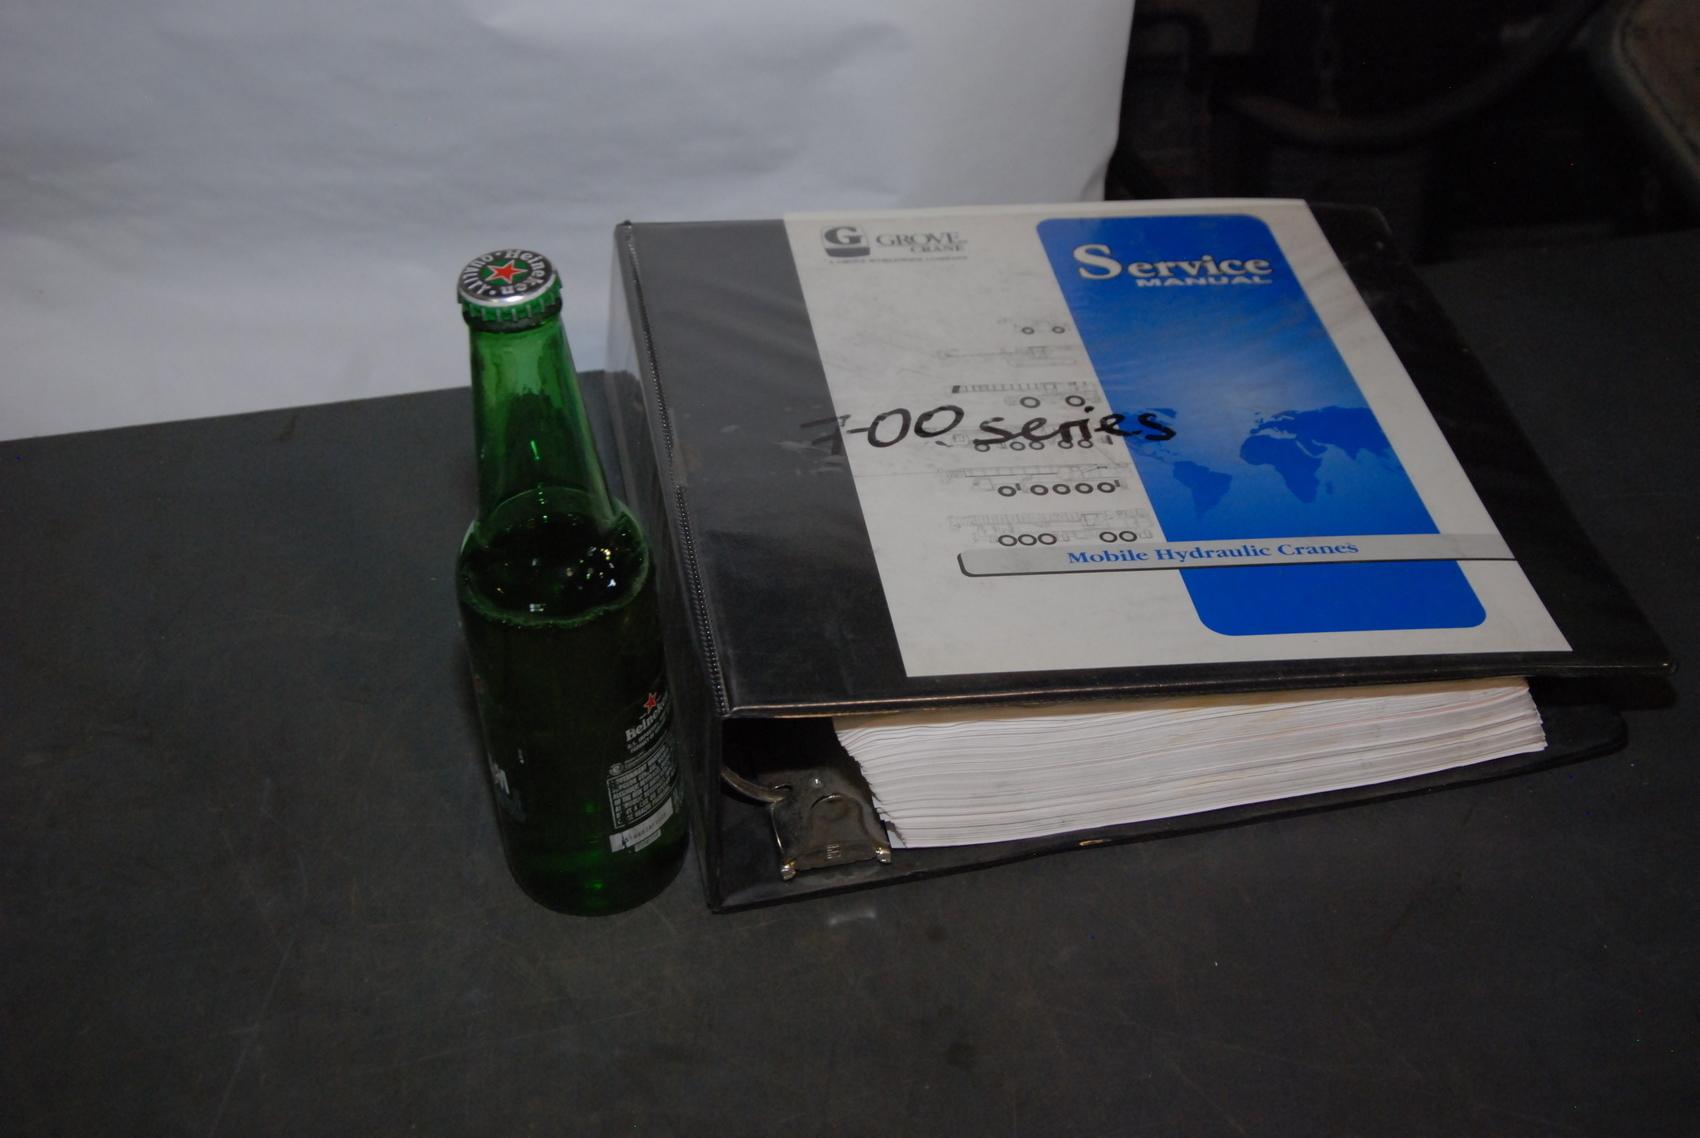 GROVE RT750 series Crane maintenance packages+service manual nopl